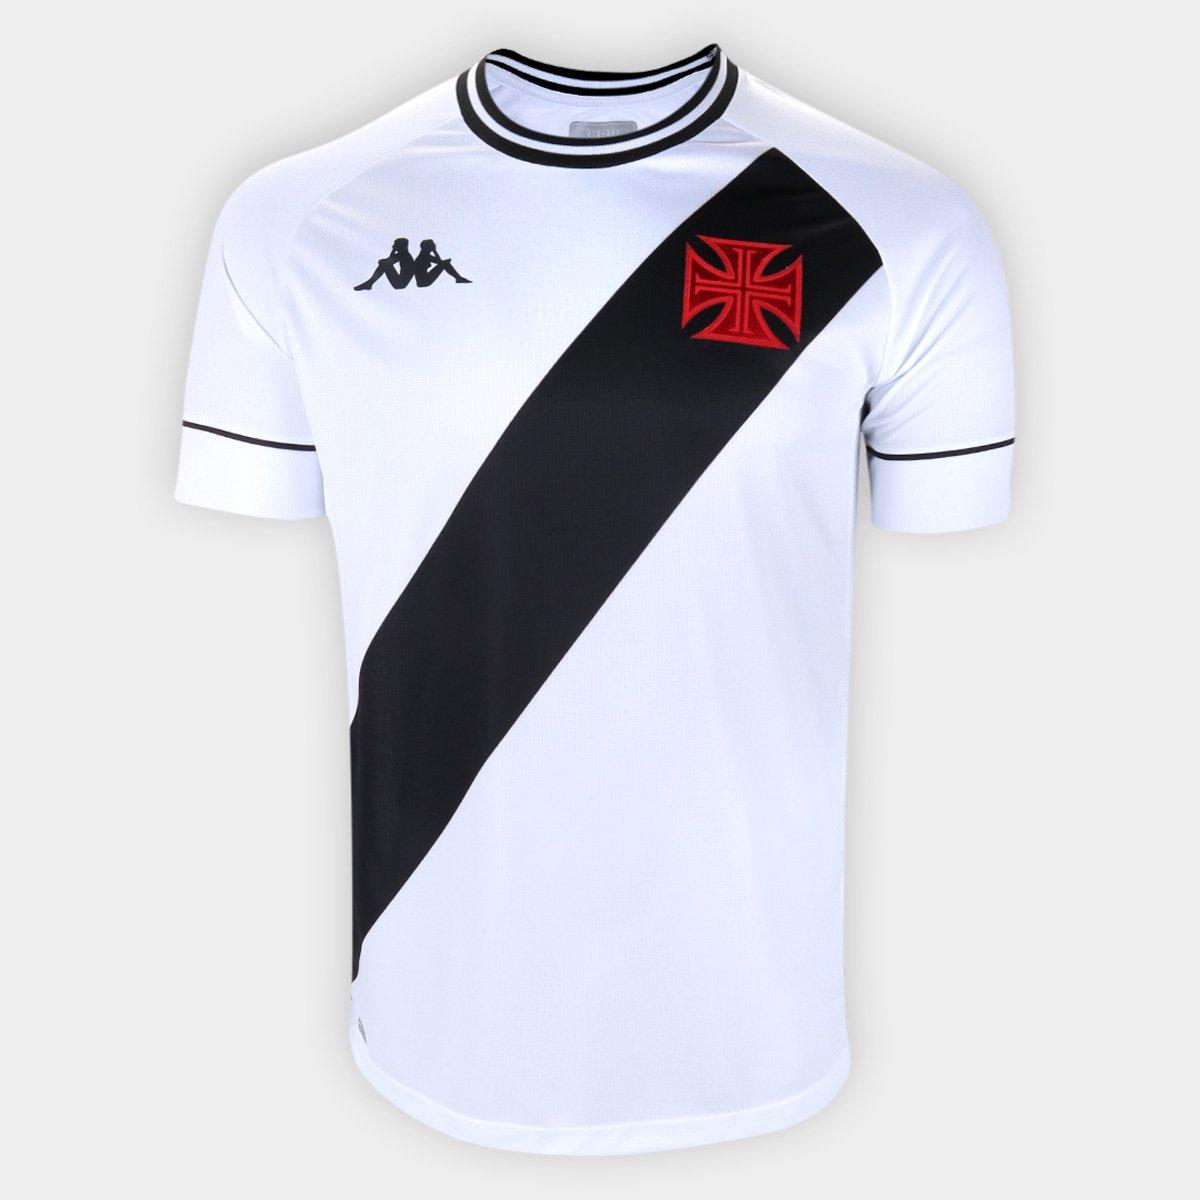 Camisa Vasco II Kappa 2020/2021 - Y. Pikachu